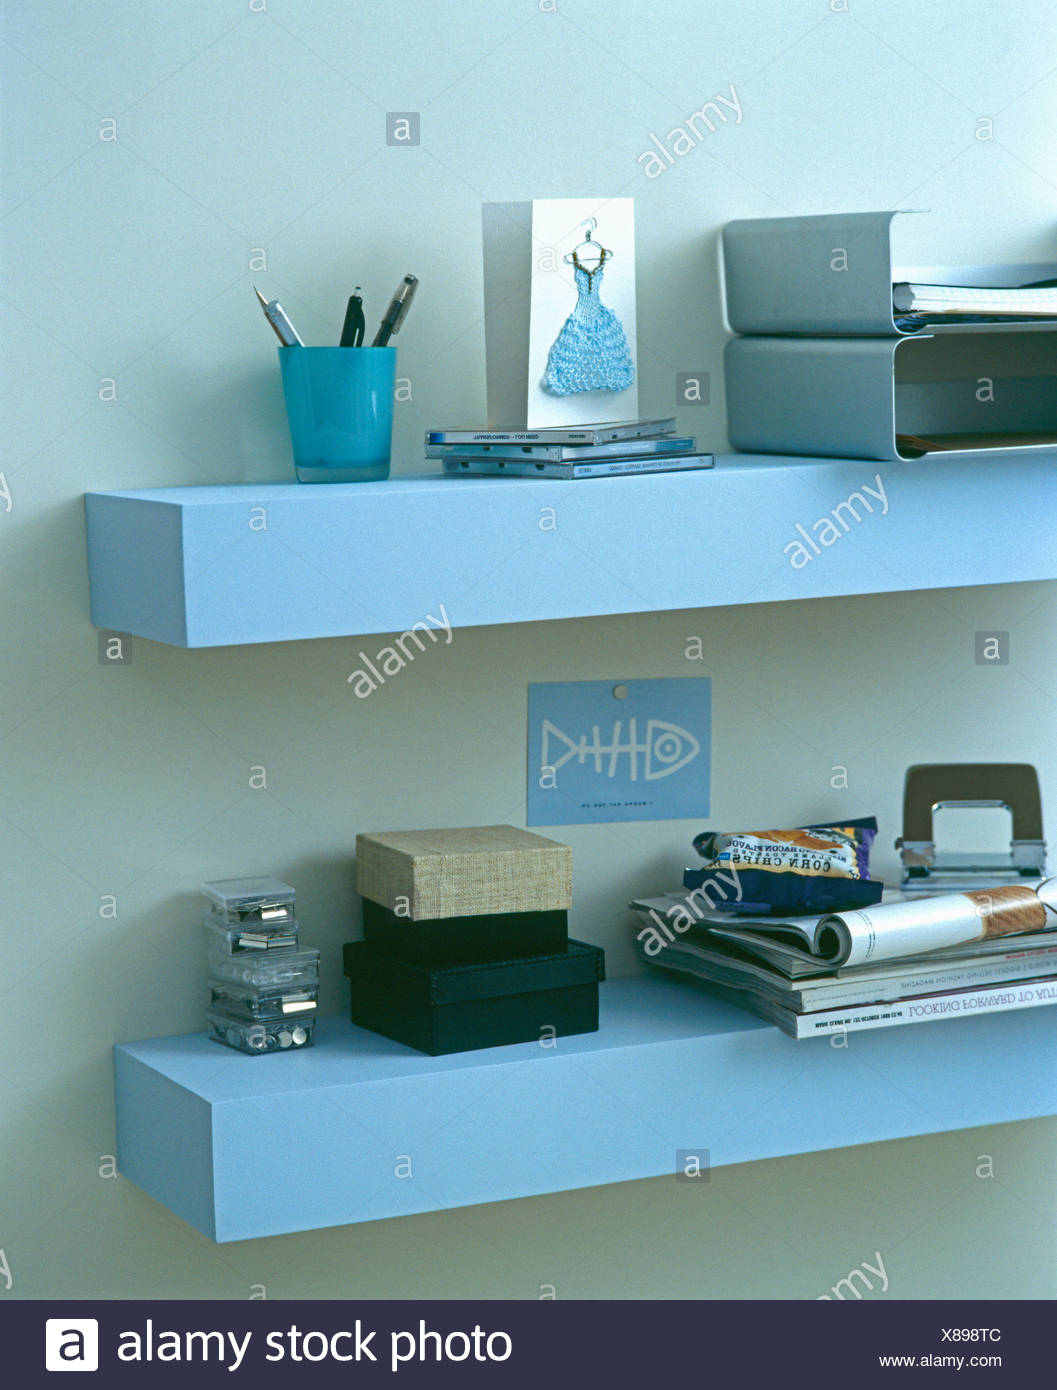 Ikea Shelving Stock Photos & Ikea Shelving Stock Images - Alamy